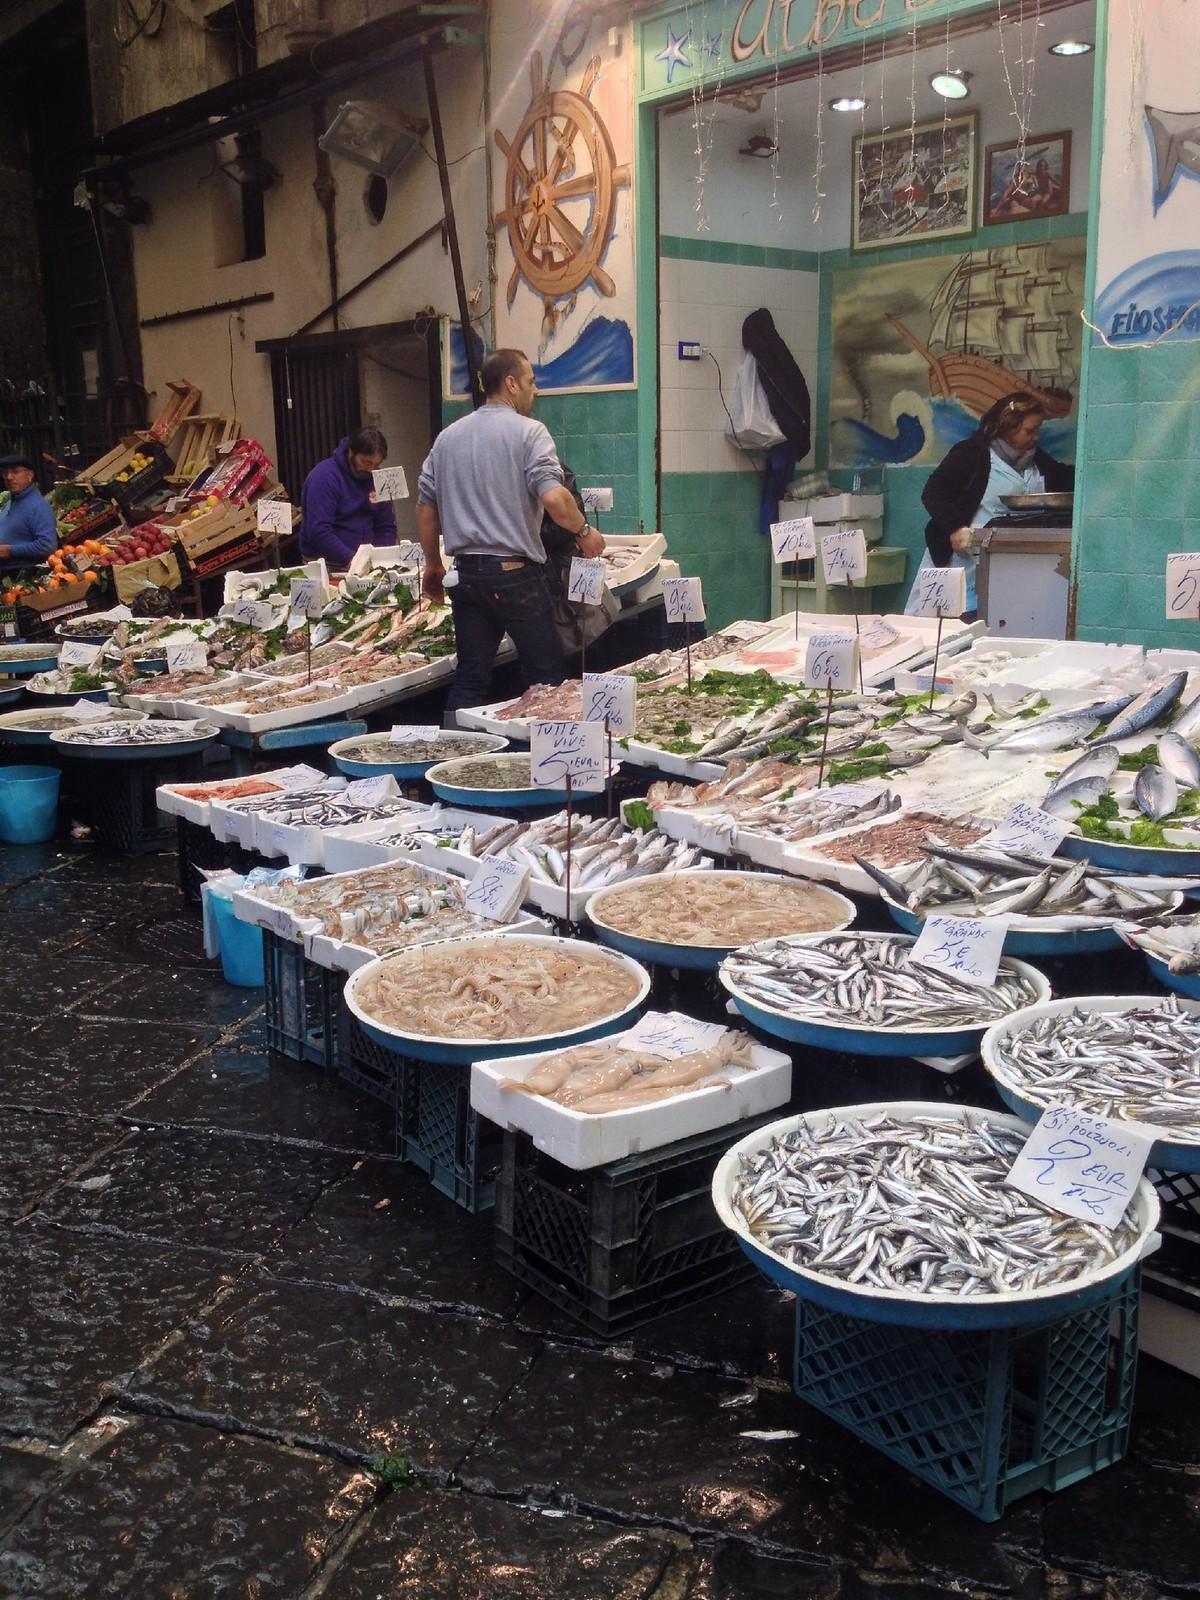 Naples fish